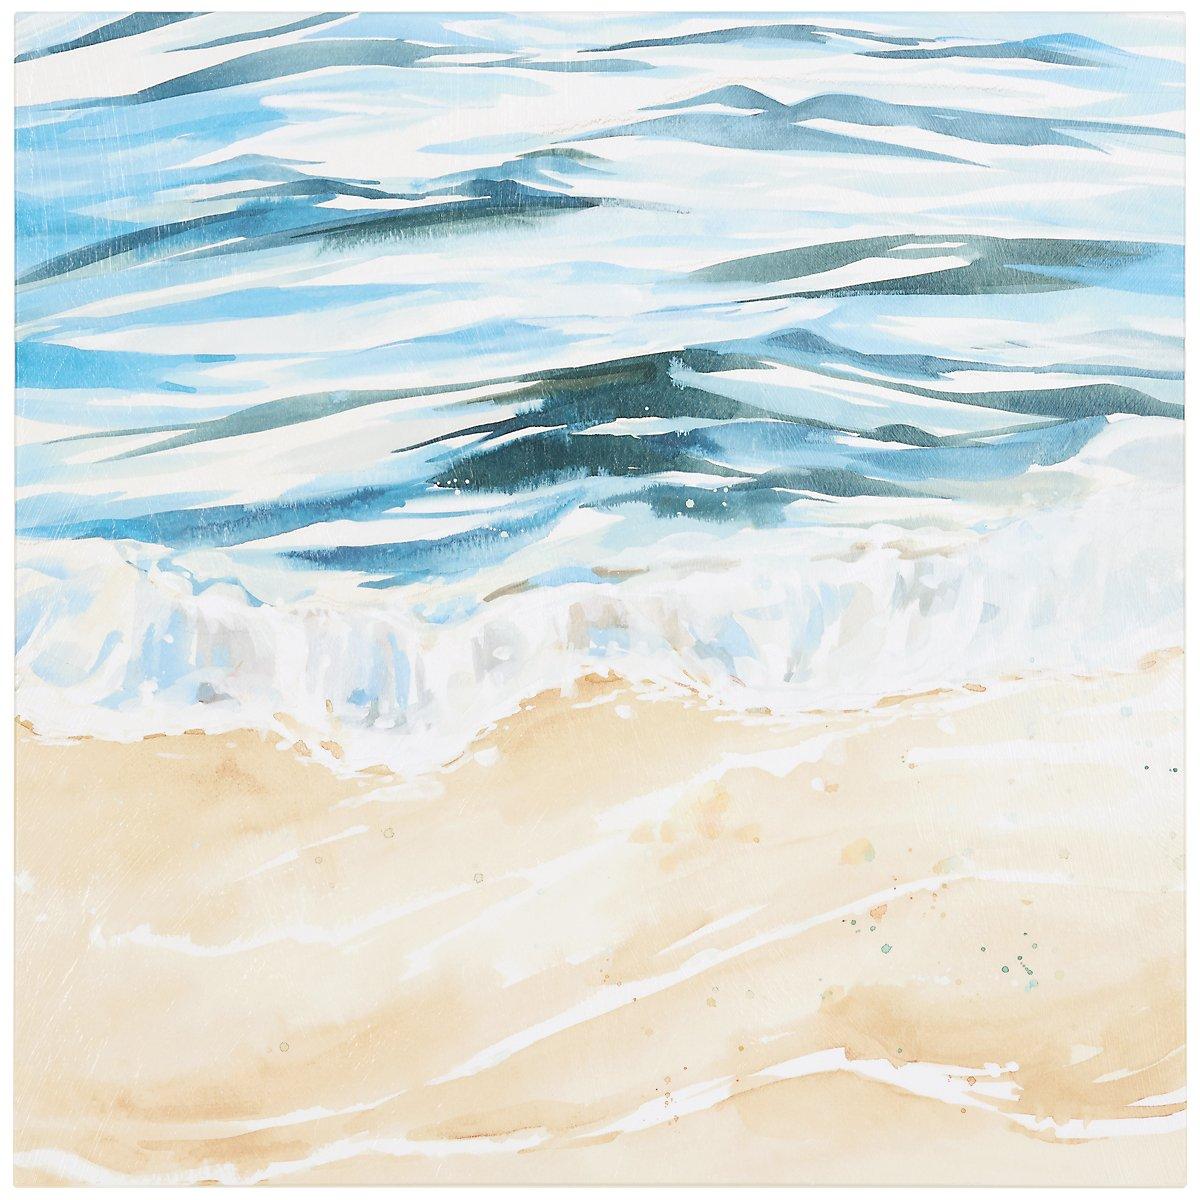 Waves Crash2 Canvas Wall Art